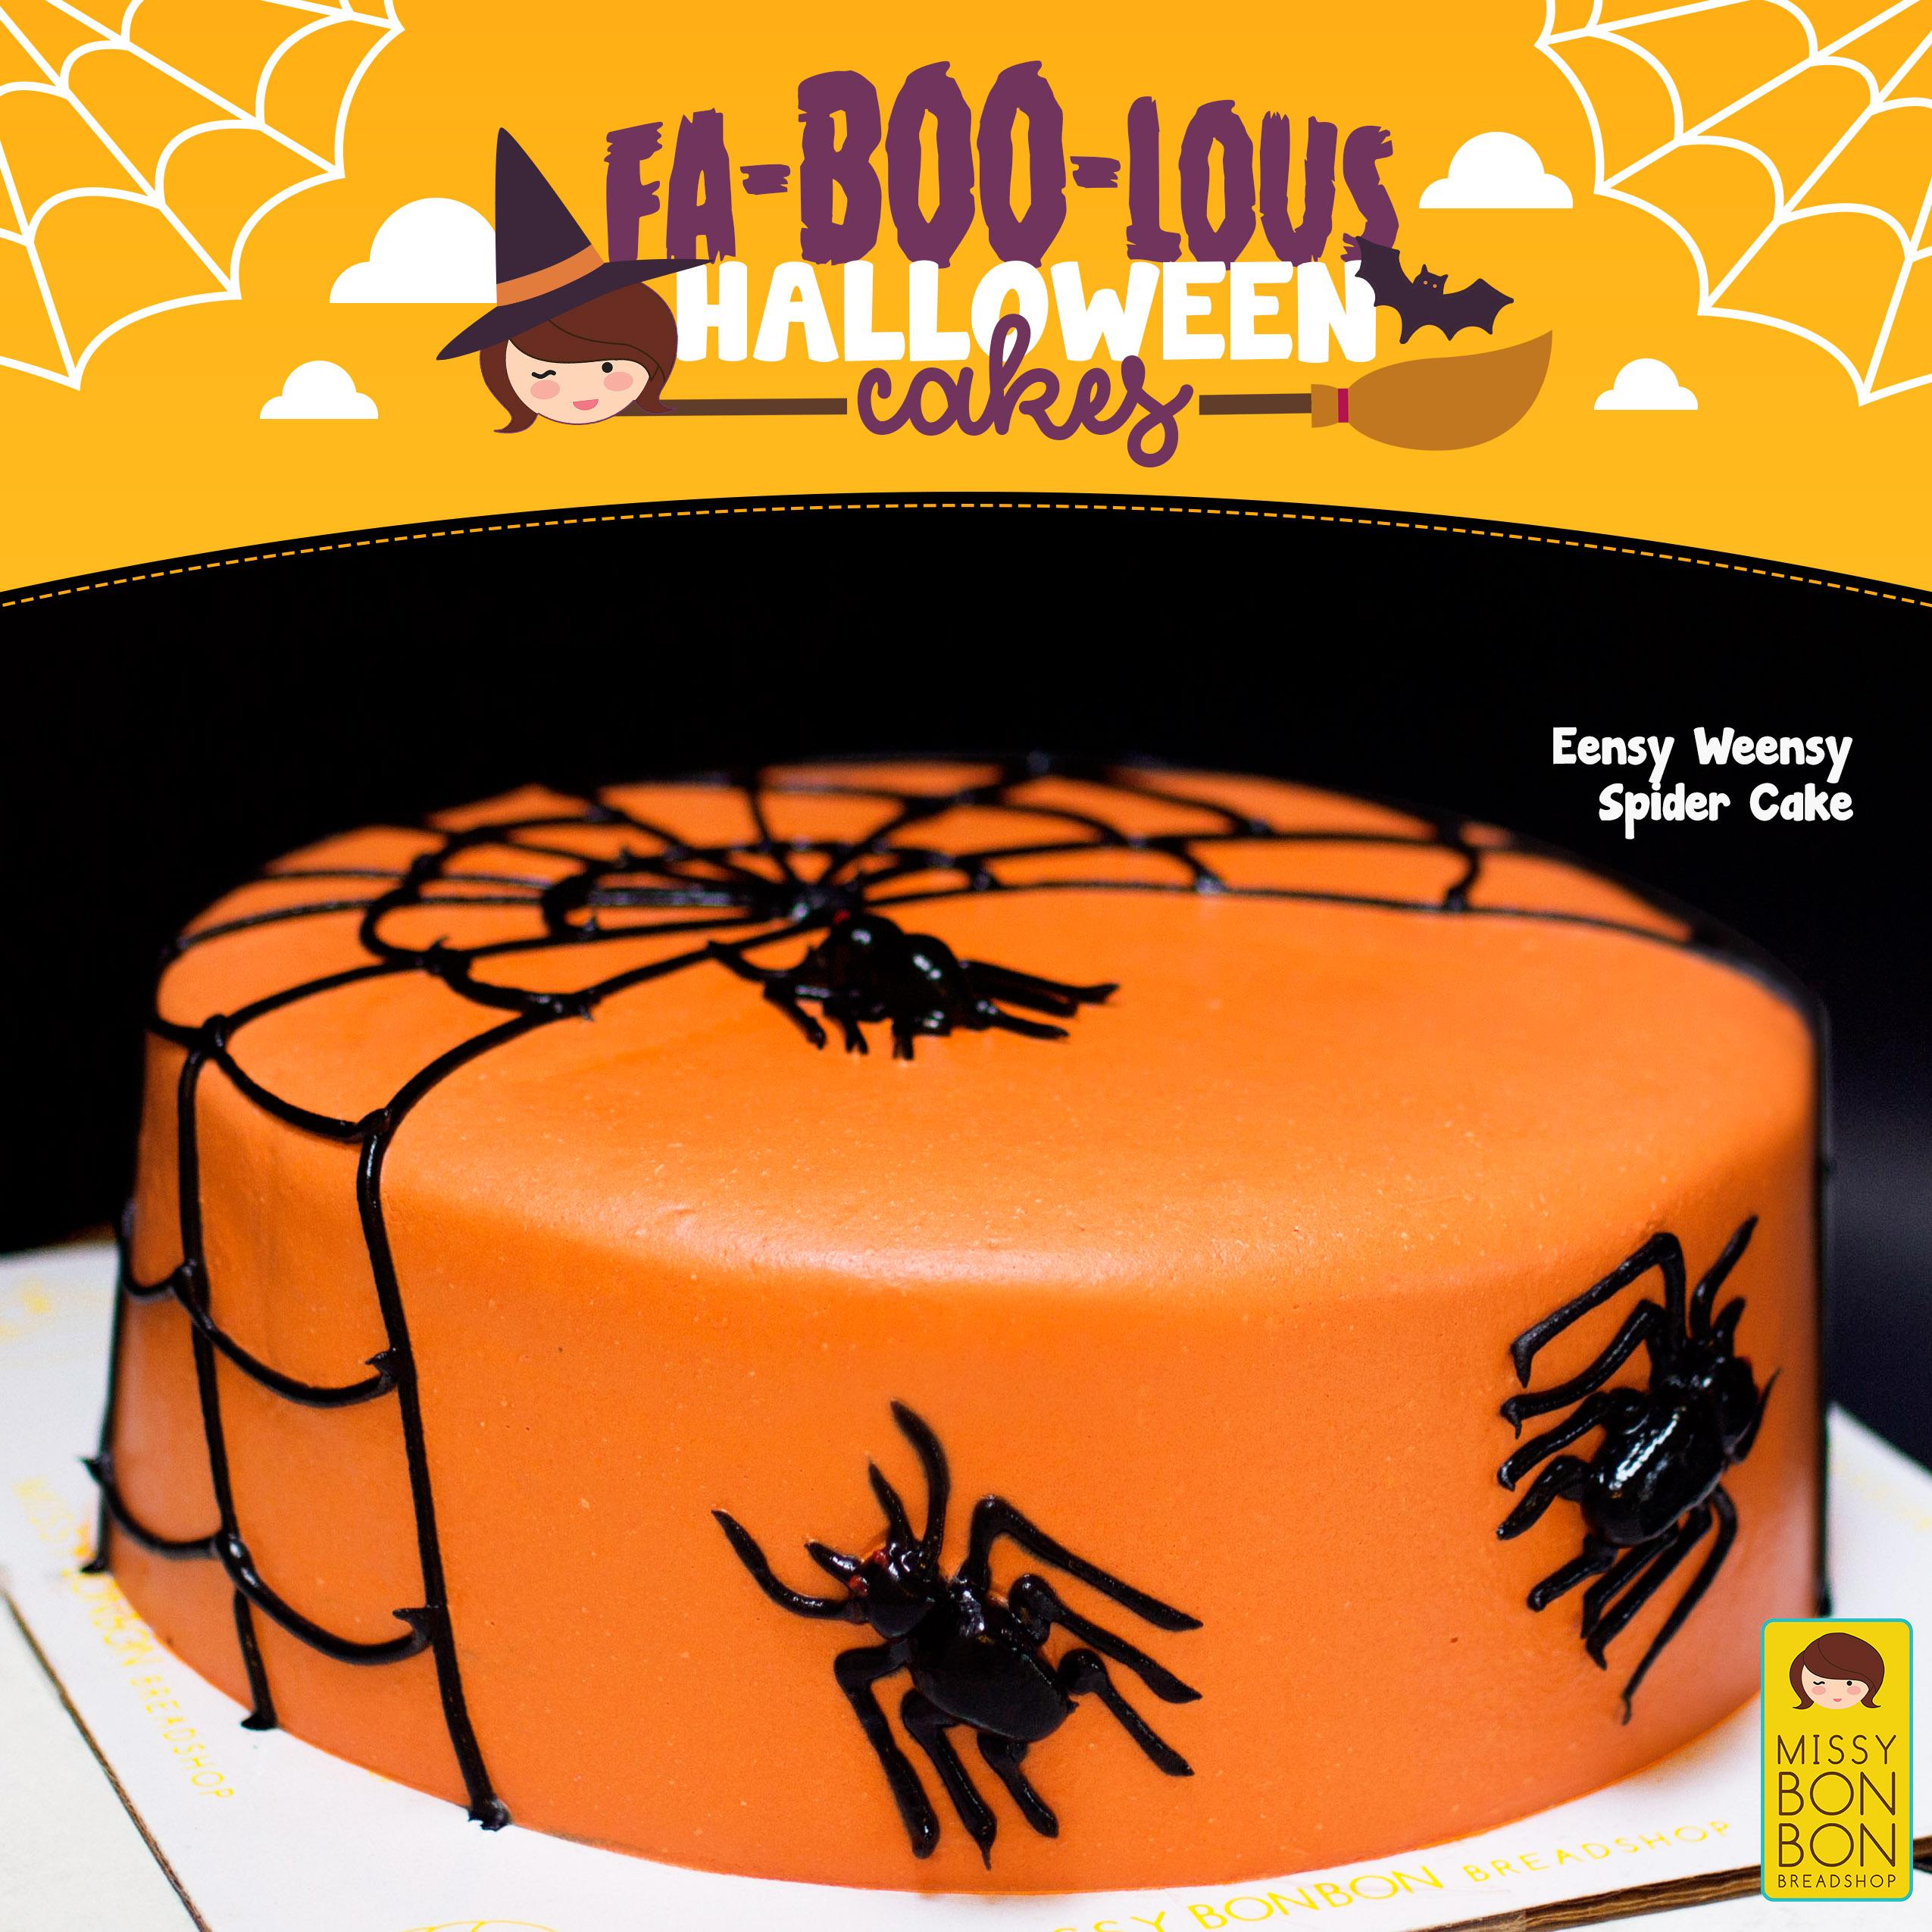 mbb-halloween-cakes-social-media-b